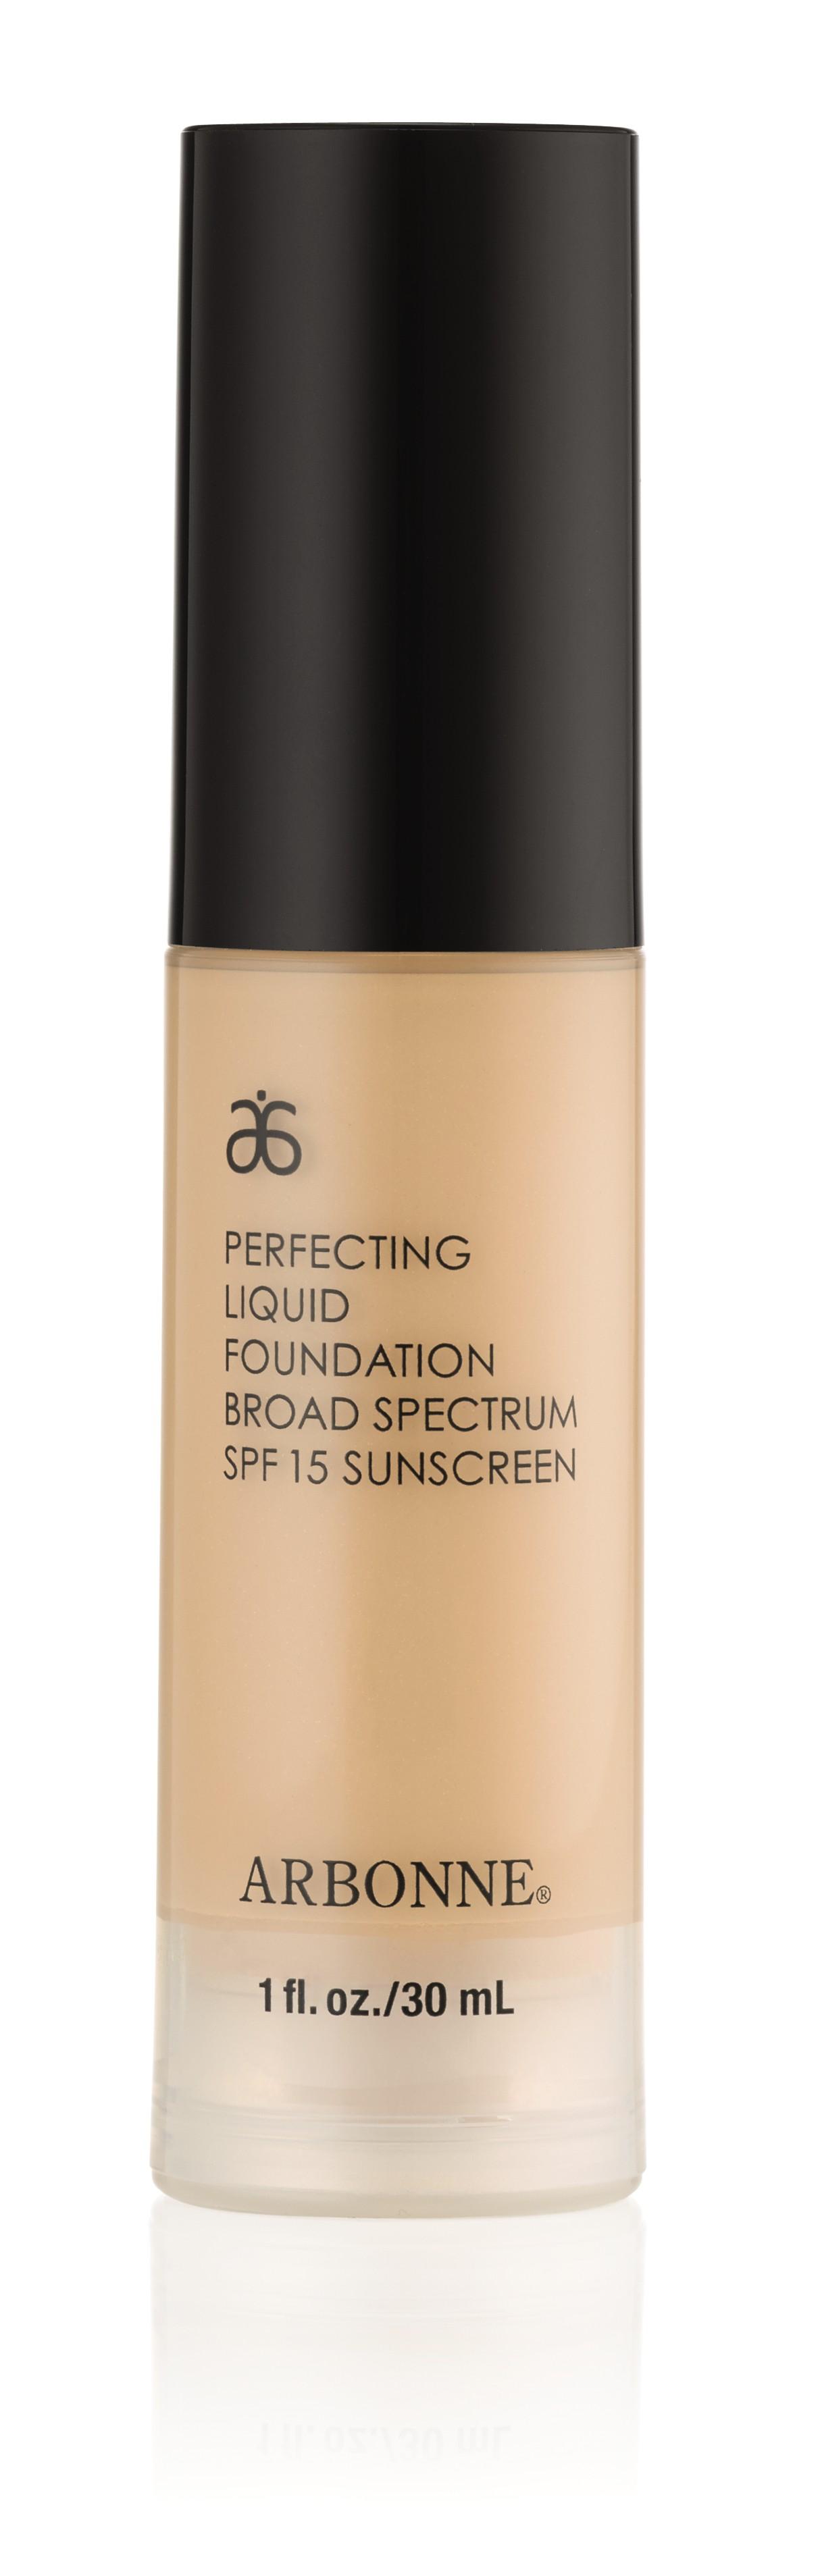 Arbonne Cosmetics Perfecting Liquid Foundation.jpg